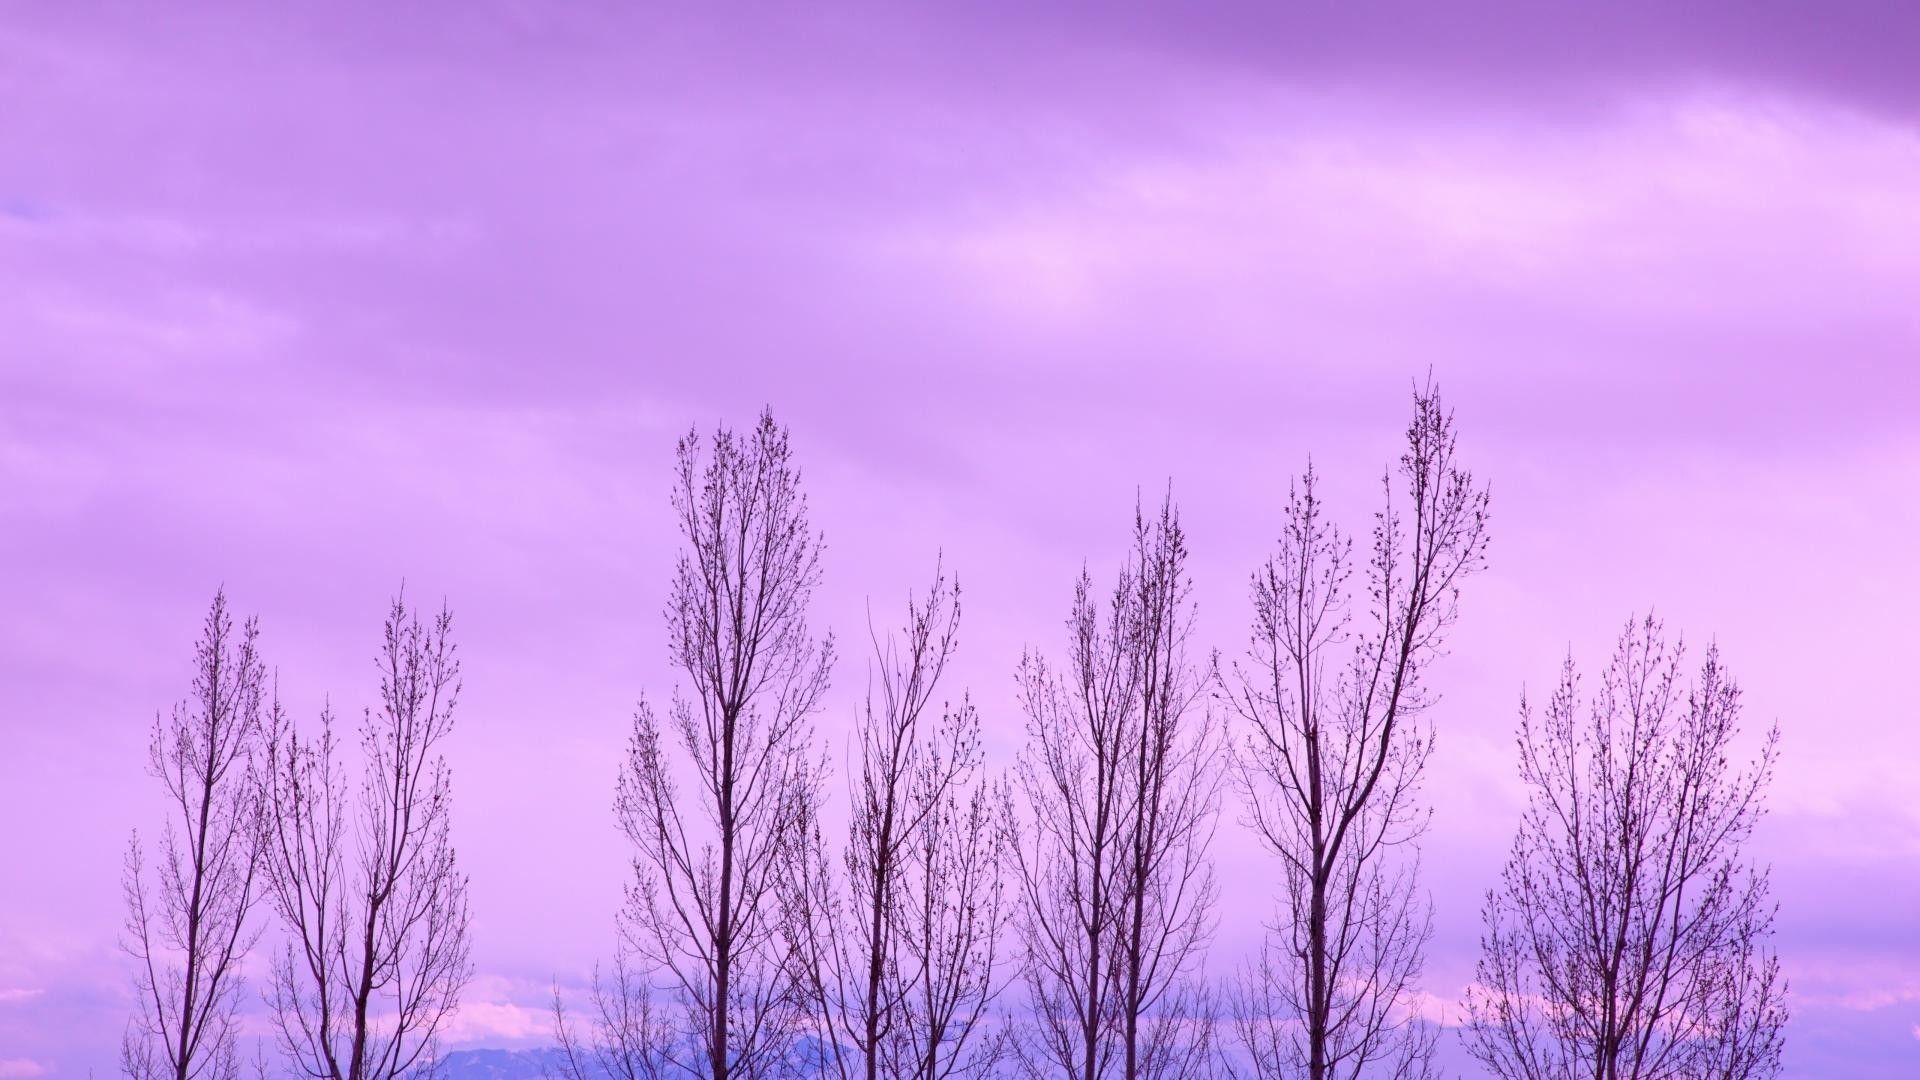 Desktop Tumblr Purple Wallpapers Wallpaper Cave